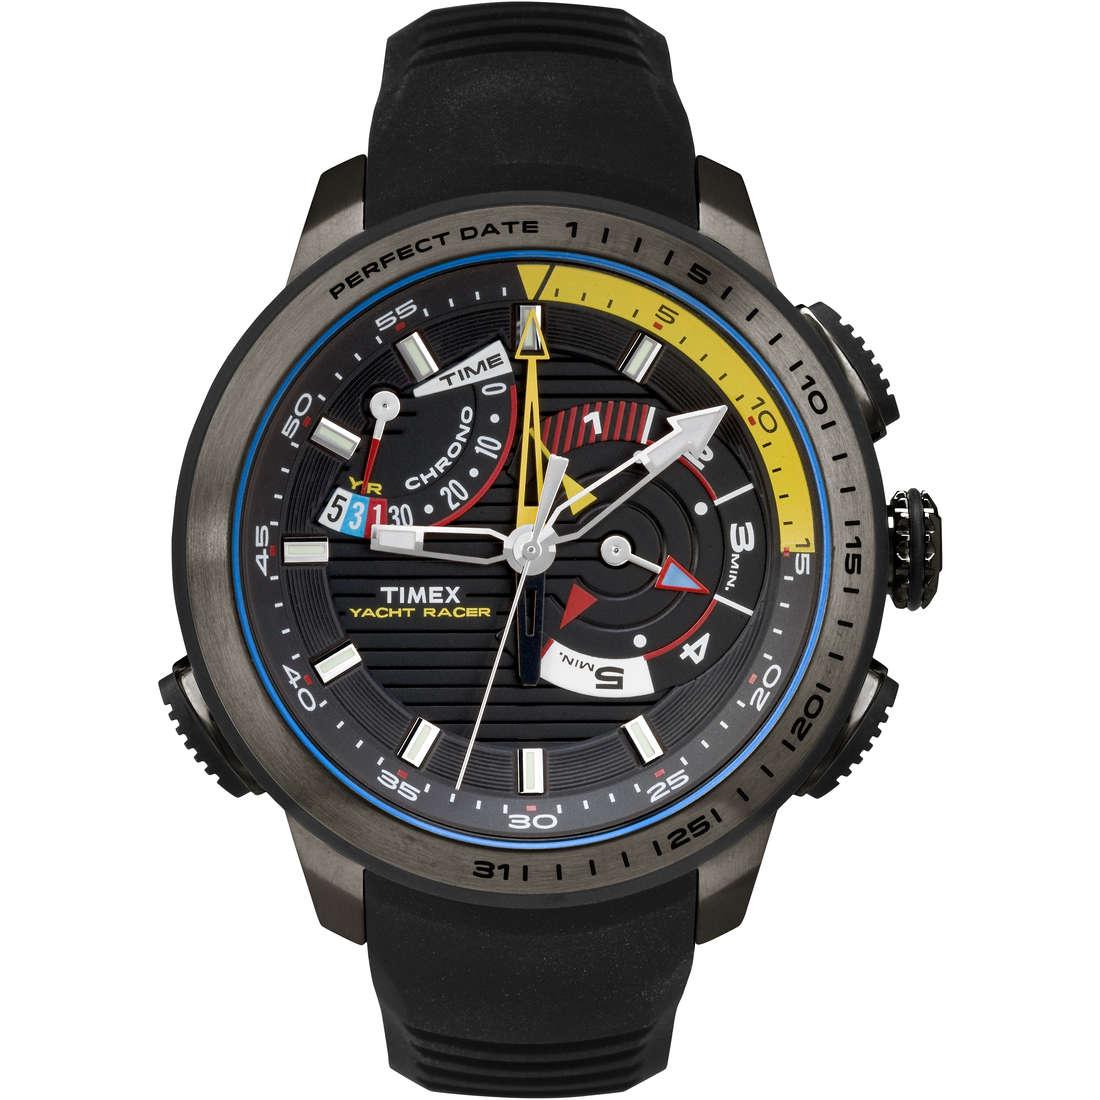 montre multifonction homme Timex Iq Yatch Racer TW2P44300